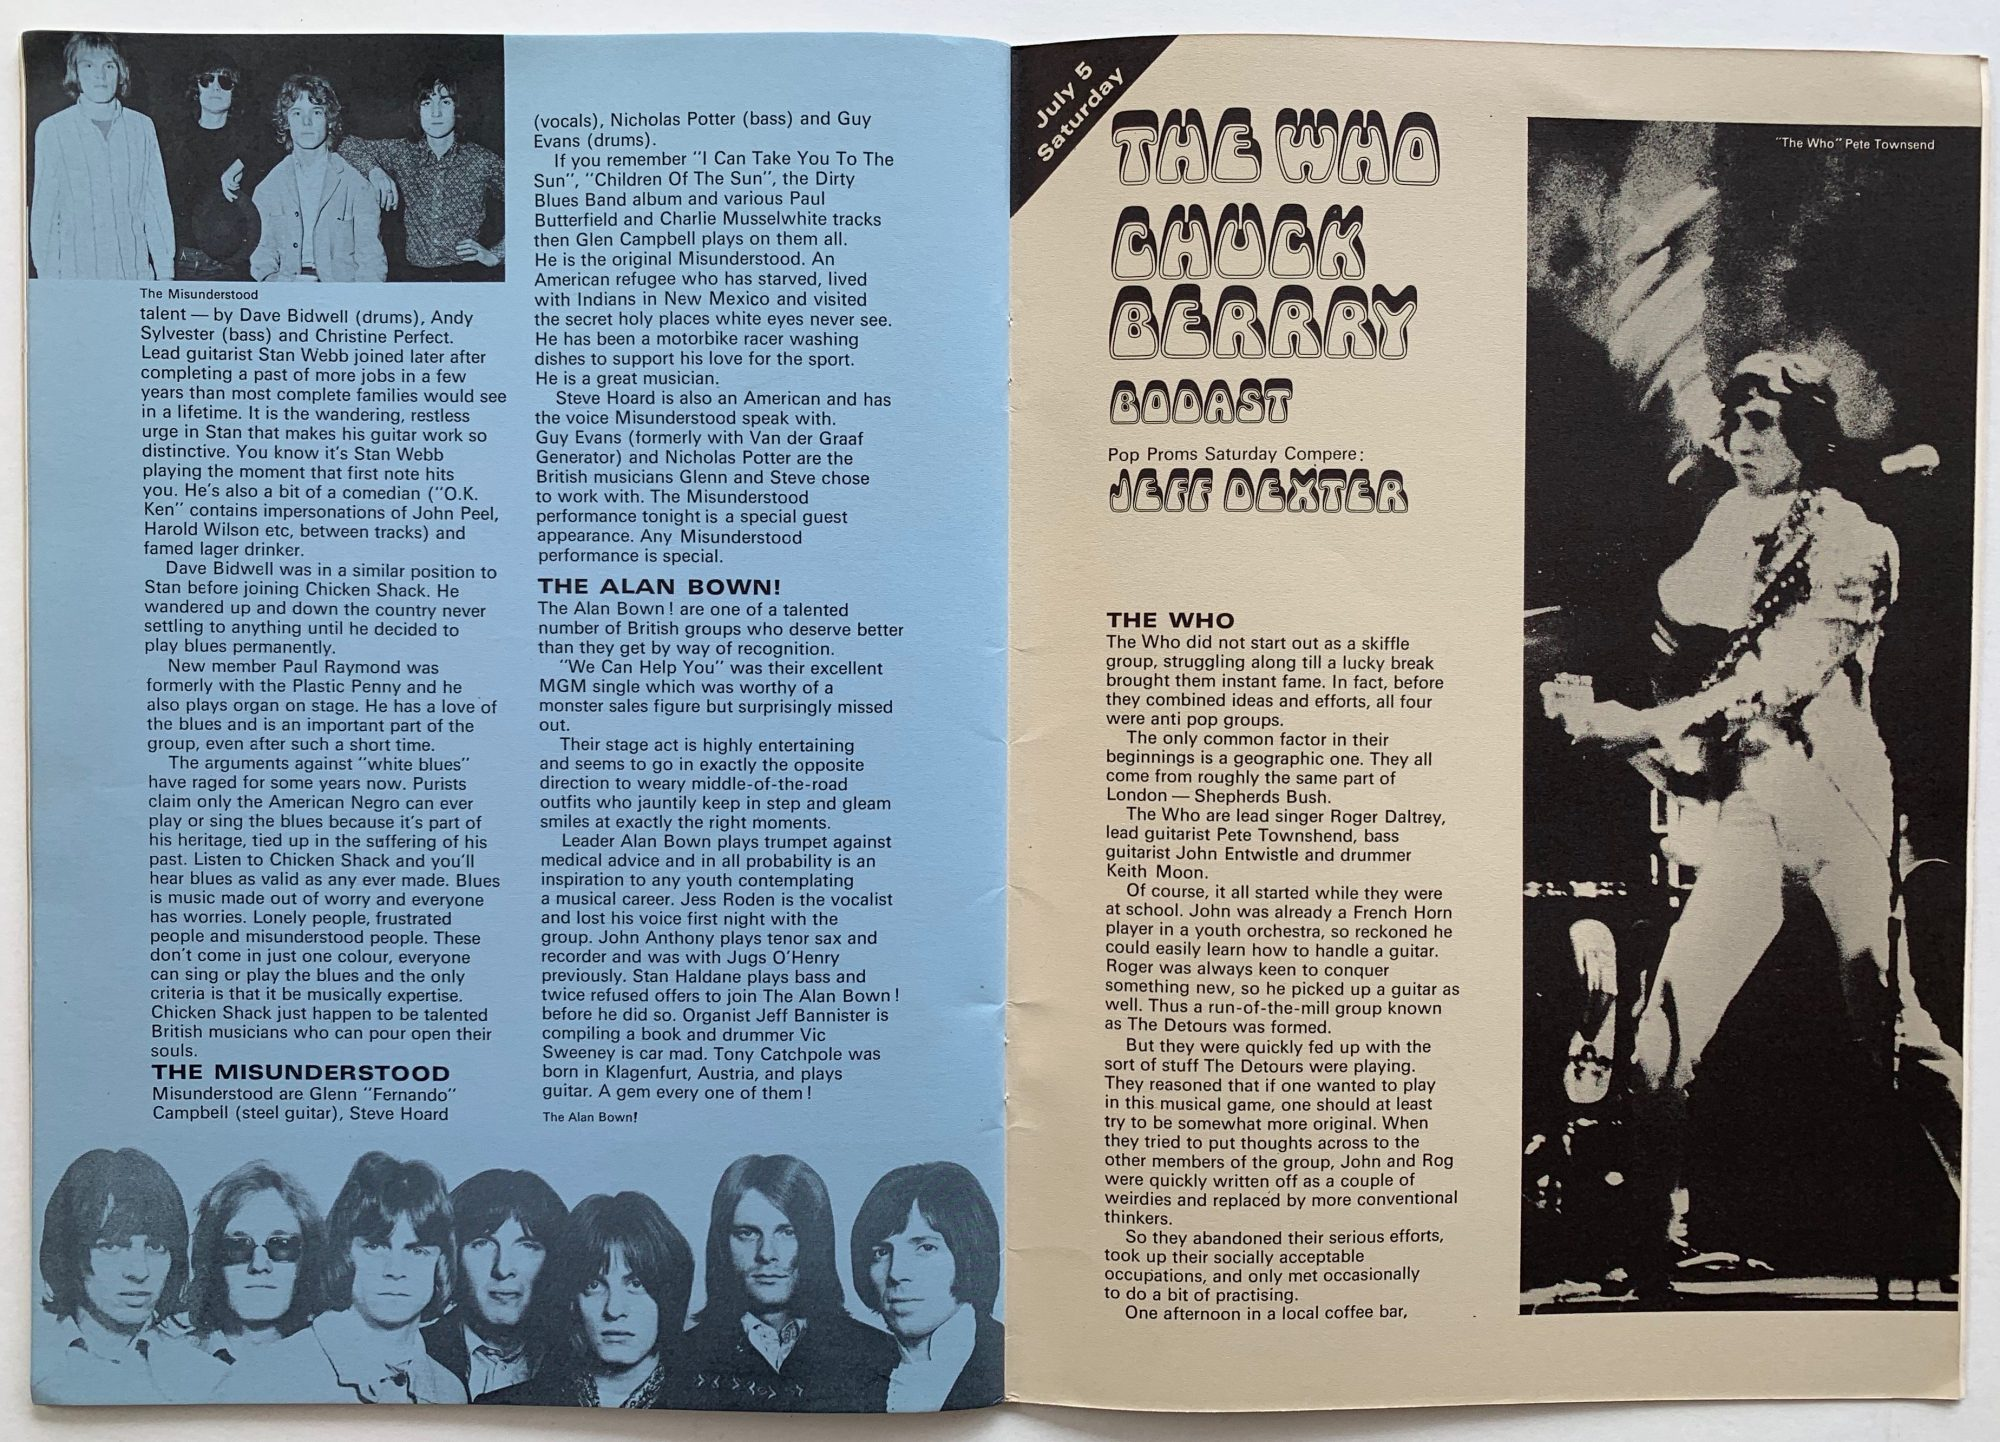 Led Zeppelin The Who Fleetwood Mac Etc 1969 Royal Albert Hall Pop Proms Concert Program